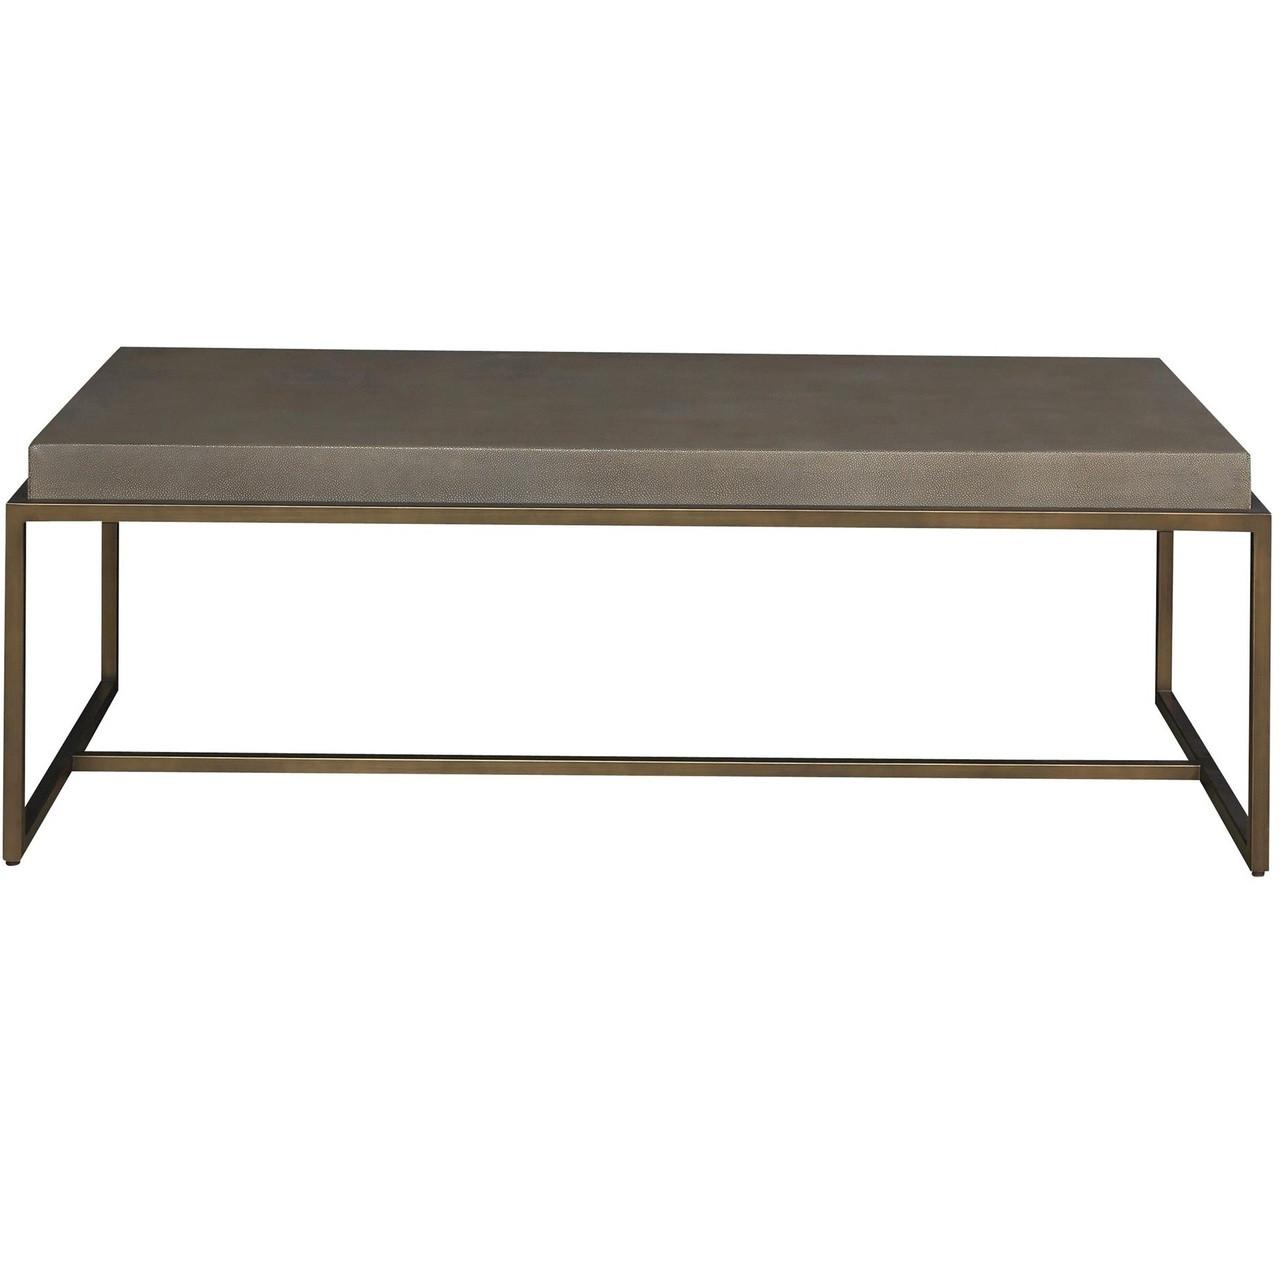 Pickford Coffee Table Bronze: Portobello Modern Shagreen Coffee Table